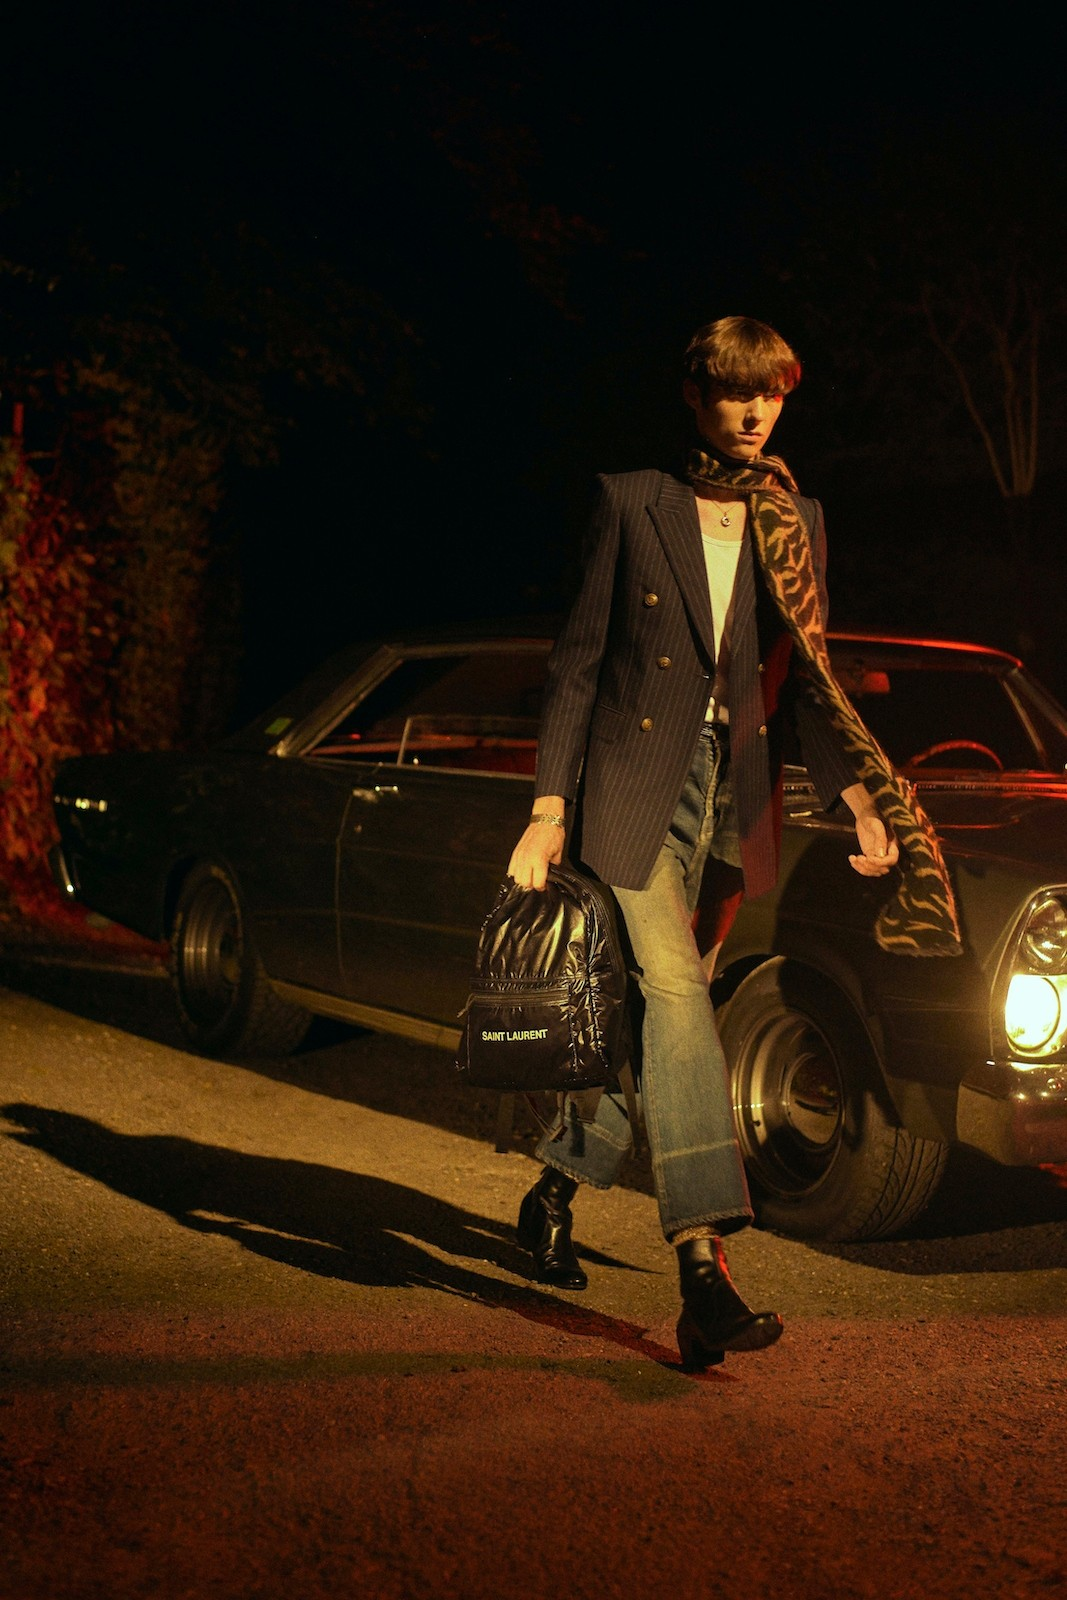 saint laurent bag collection campaign vintage cars getaway noe tote nuxx backpack camp duffel